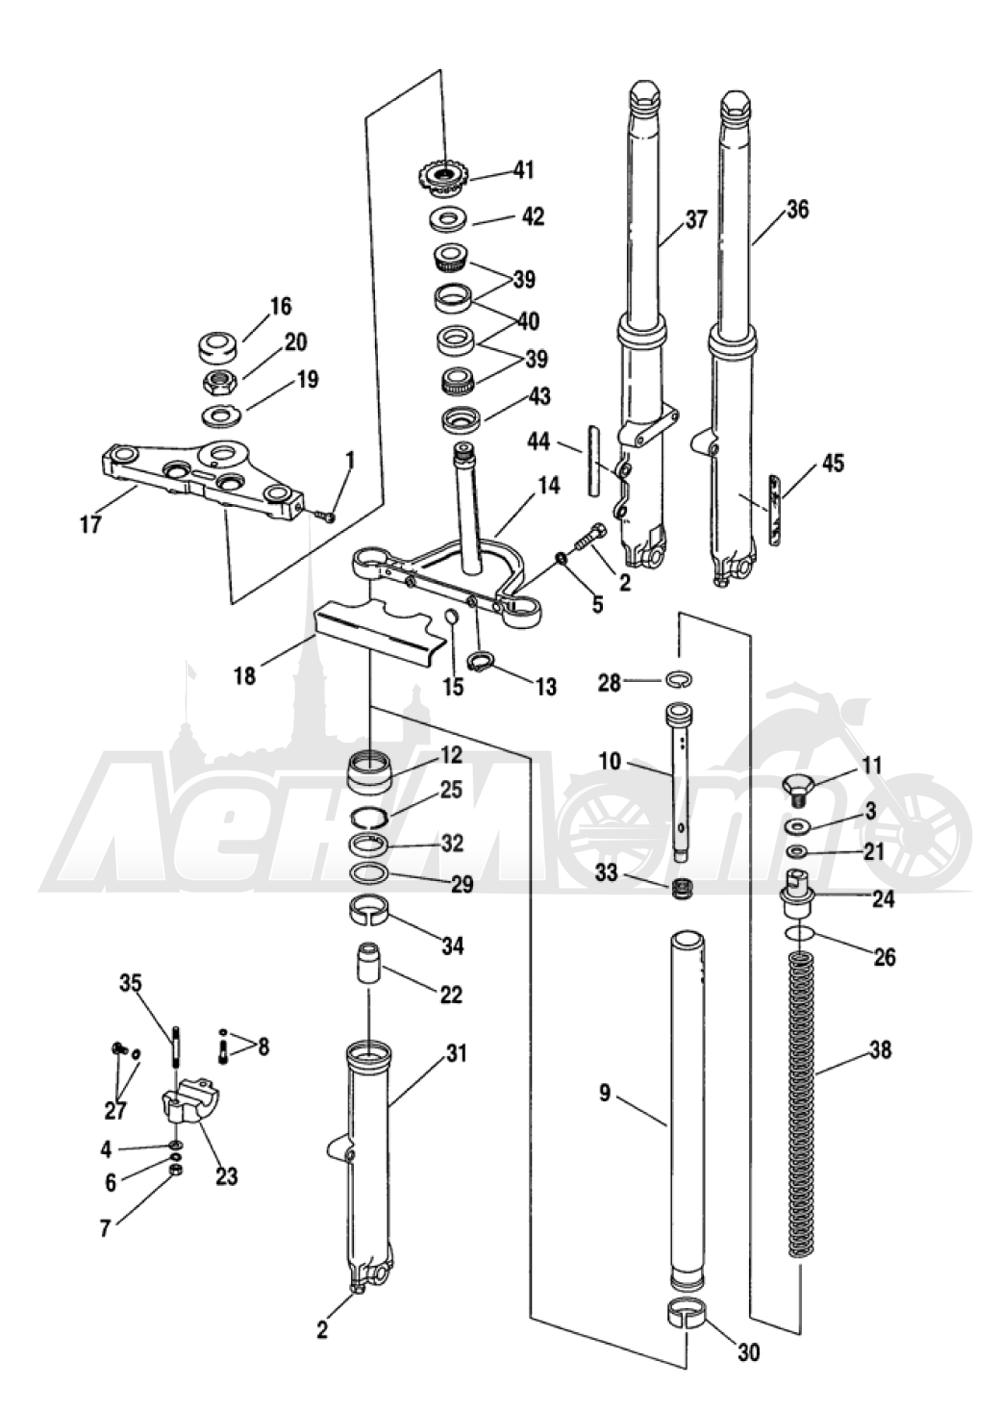 Запчасти для Мотоцикла Harley-Davidson 2005 FXDWGI DYNA® WIDE GLIDE (INJECTION) (GD) Раздел: SUSPENSION - FRONT FORK ASSEMBLY W/ STEERING STEM | передняя подвеска вилка в сборе вместе с рулевое управление стойка